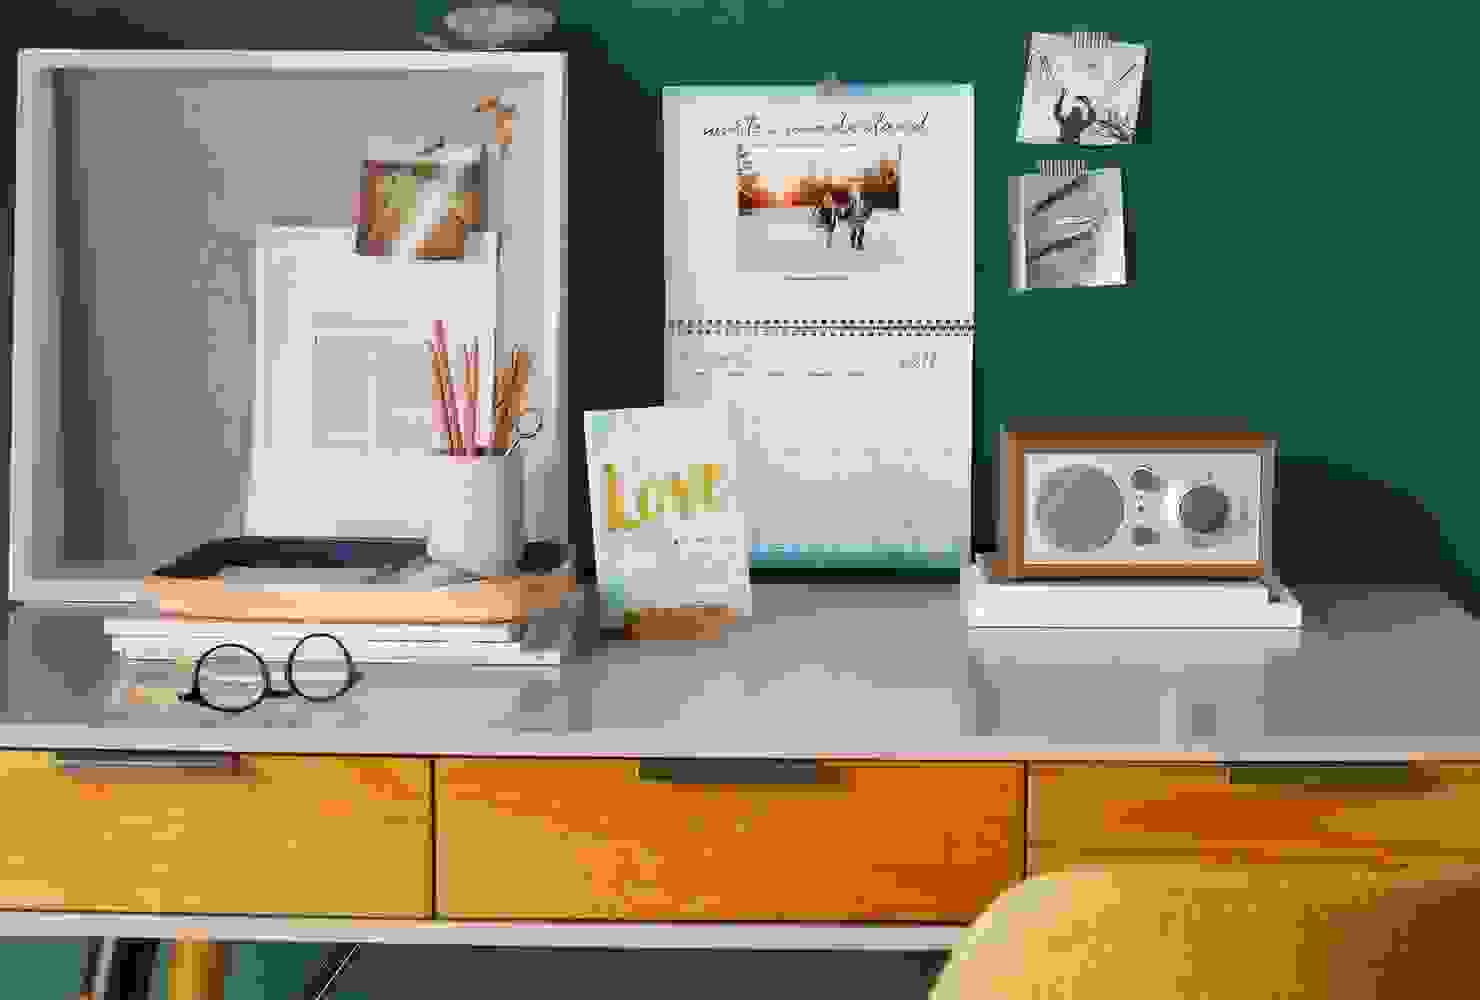 Organized work surface | Source: shutterfly.com